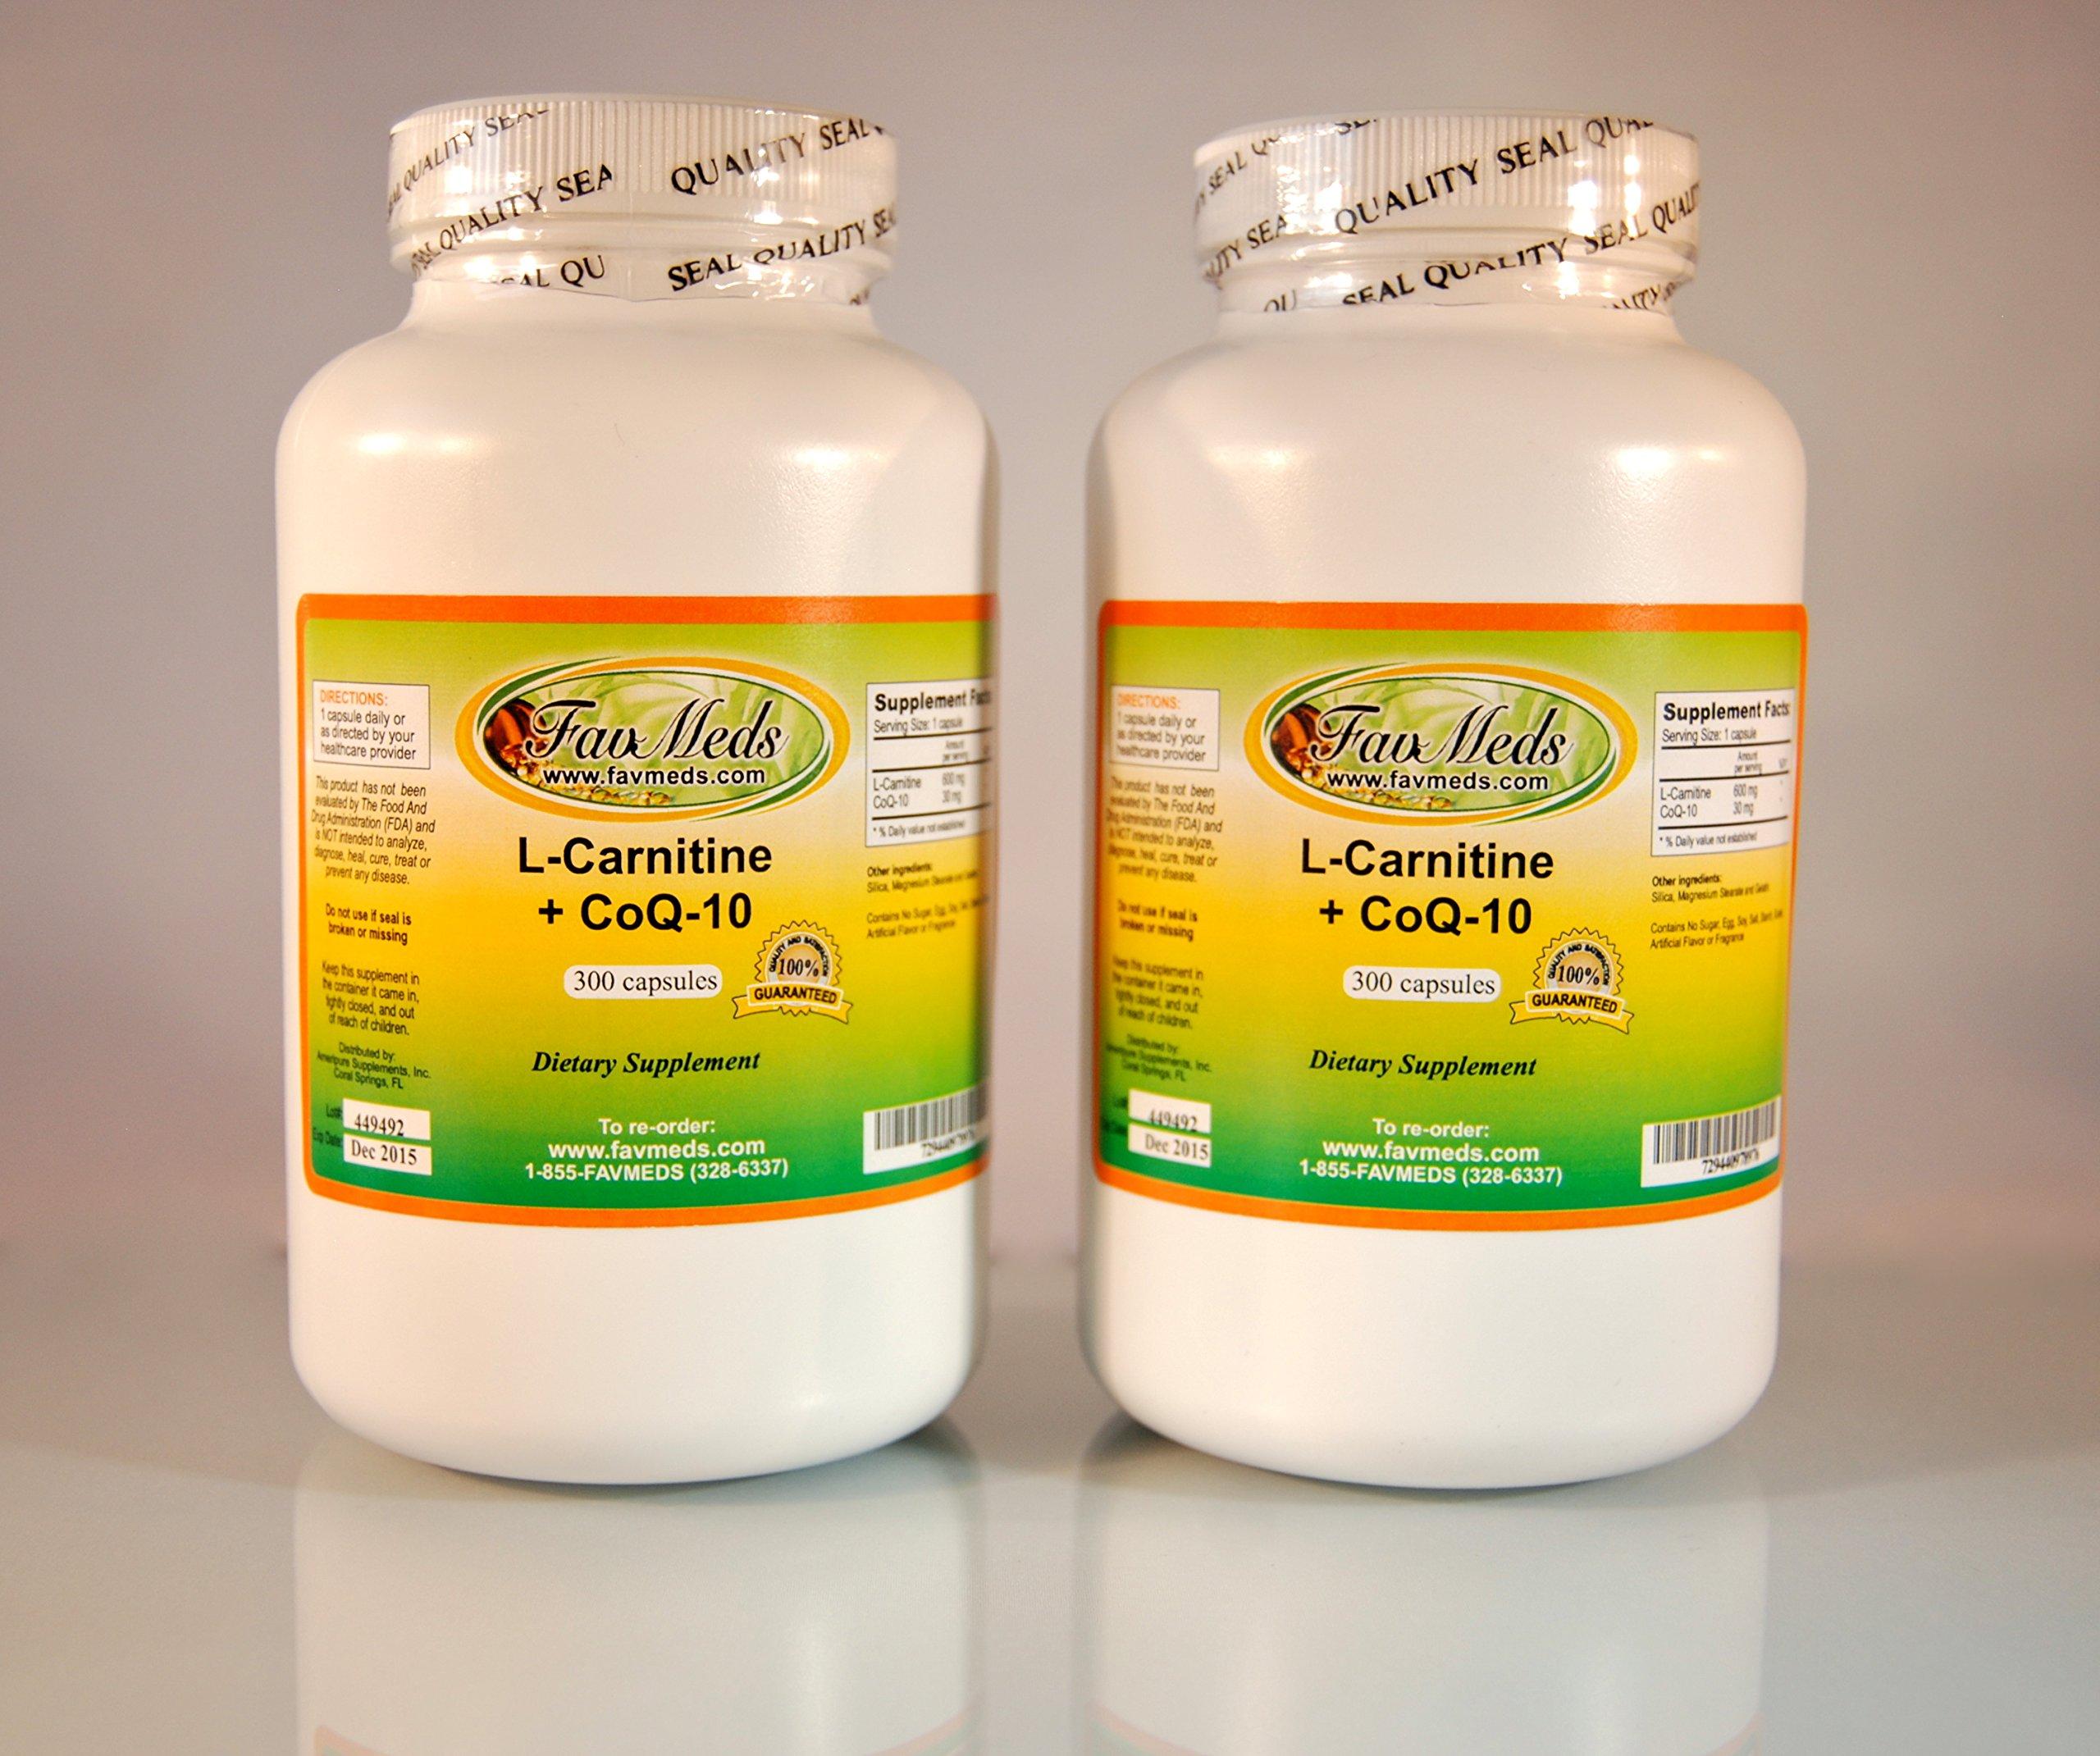 L-Carnitine 600mg + Coq-10 (2 bottles - 600 [2x300] capsules)